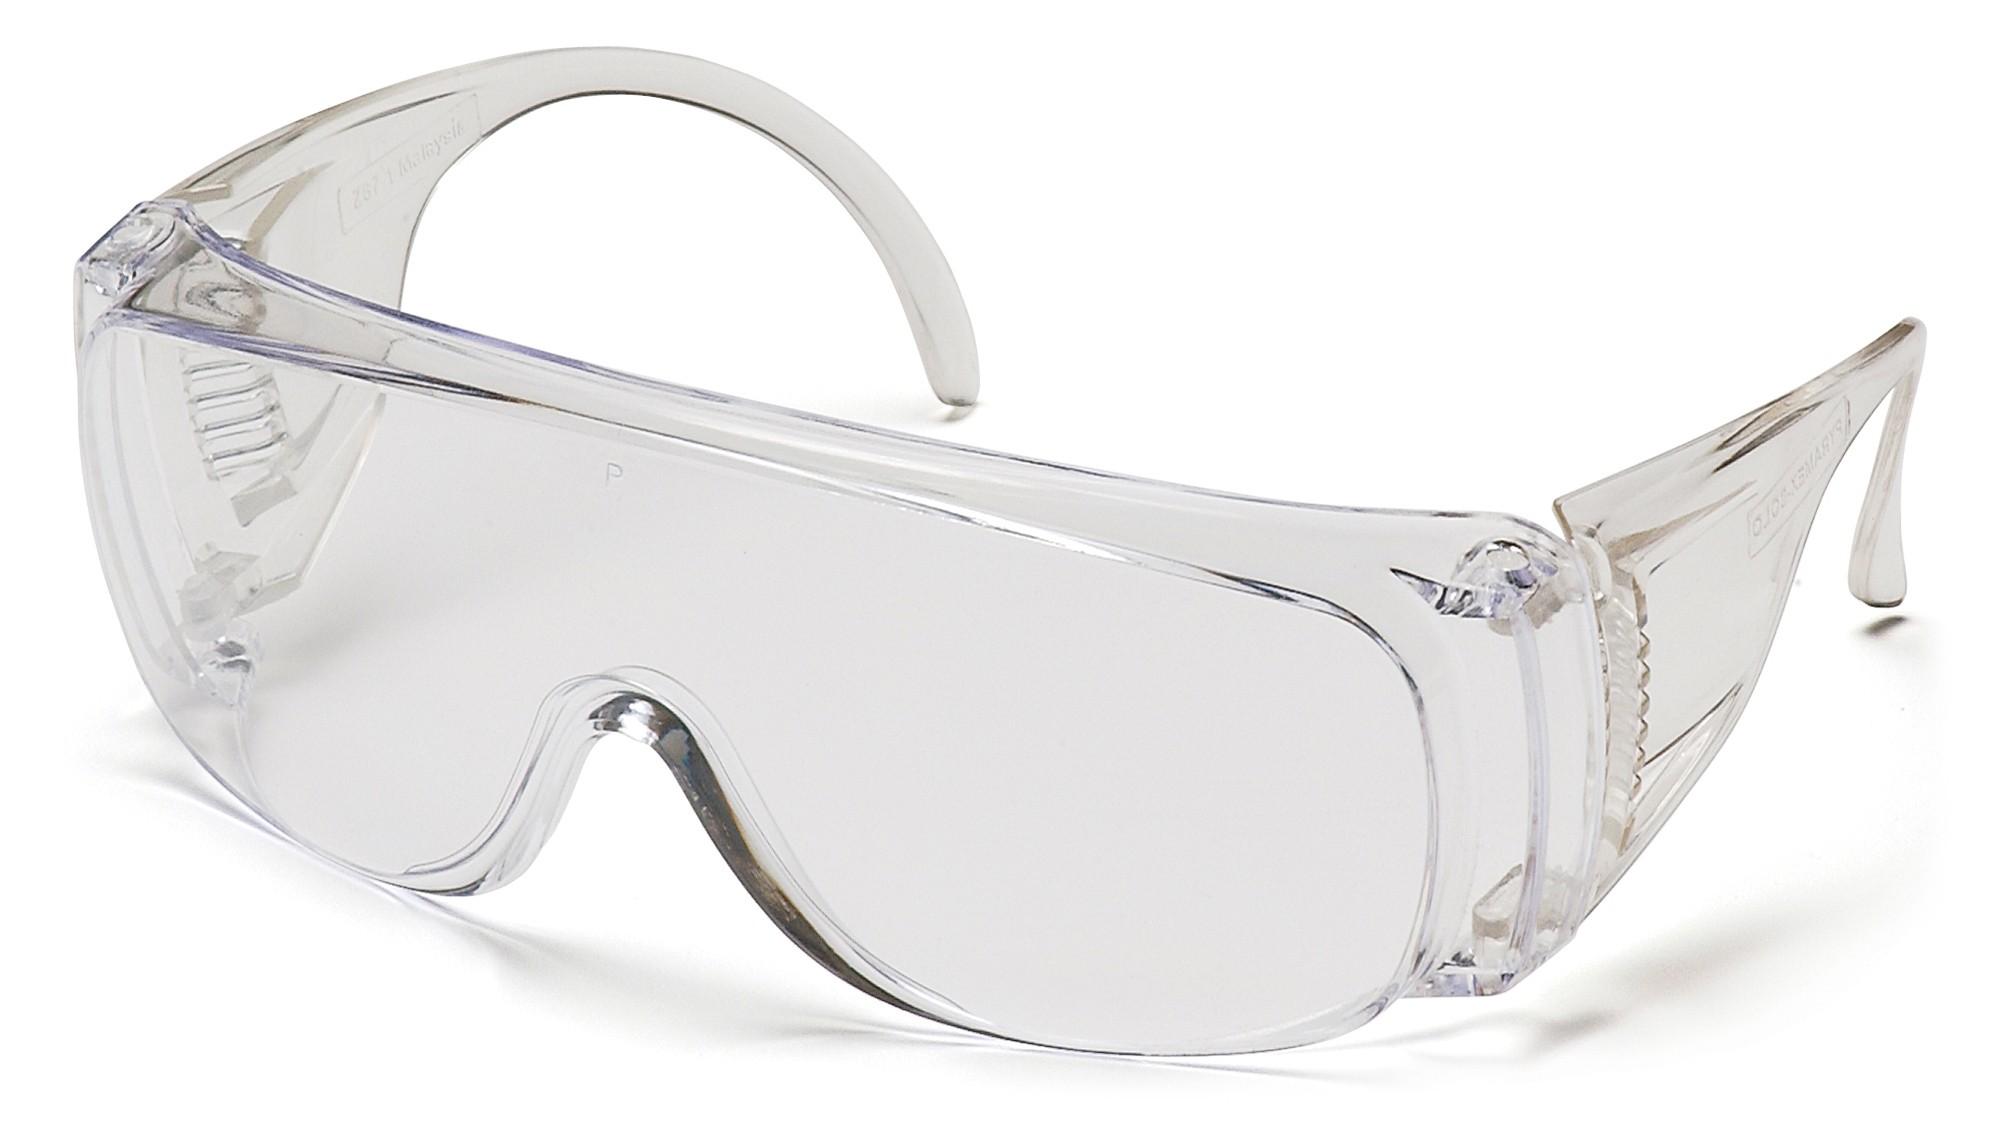 Safety Glasses - over Prescription Eyewear